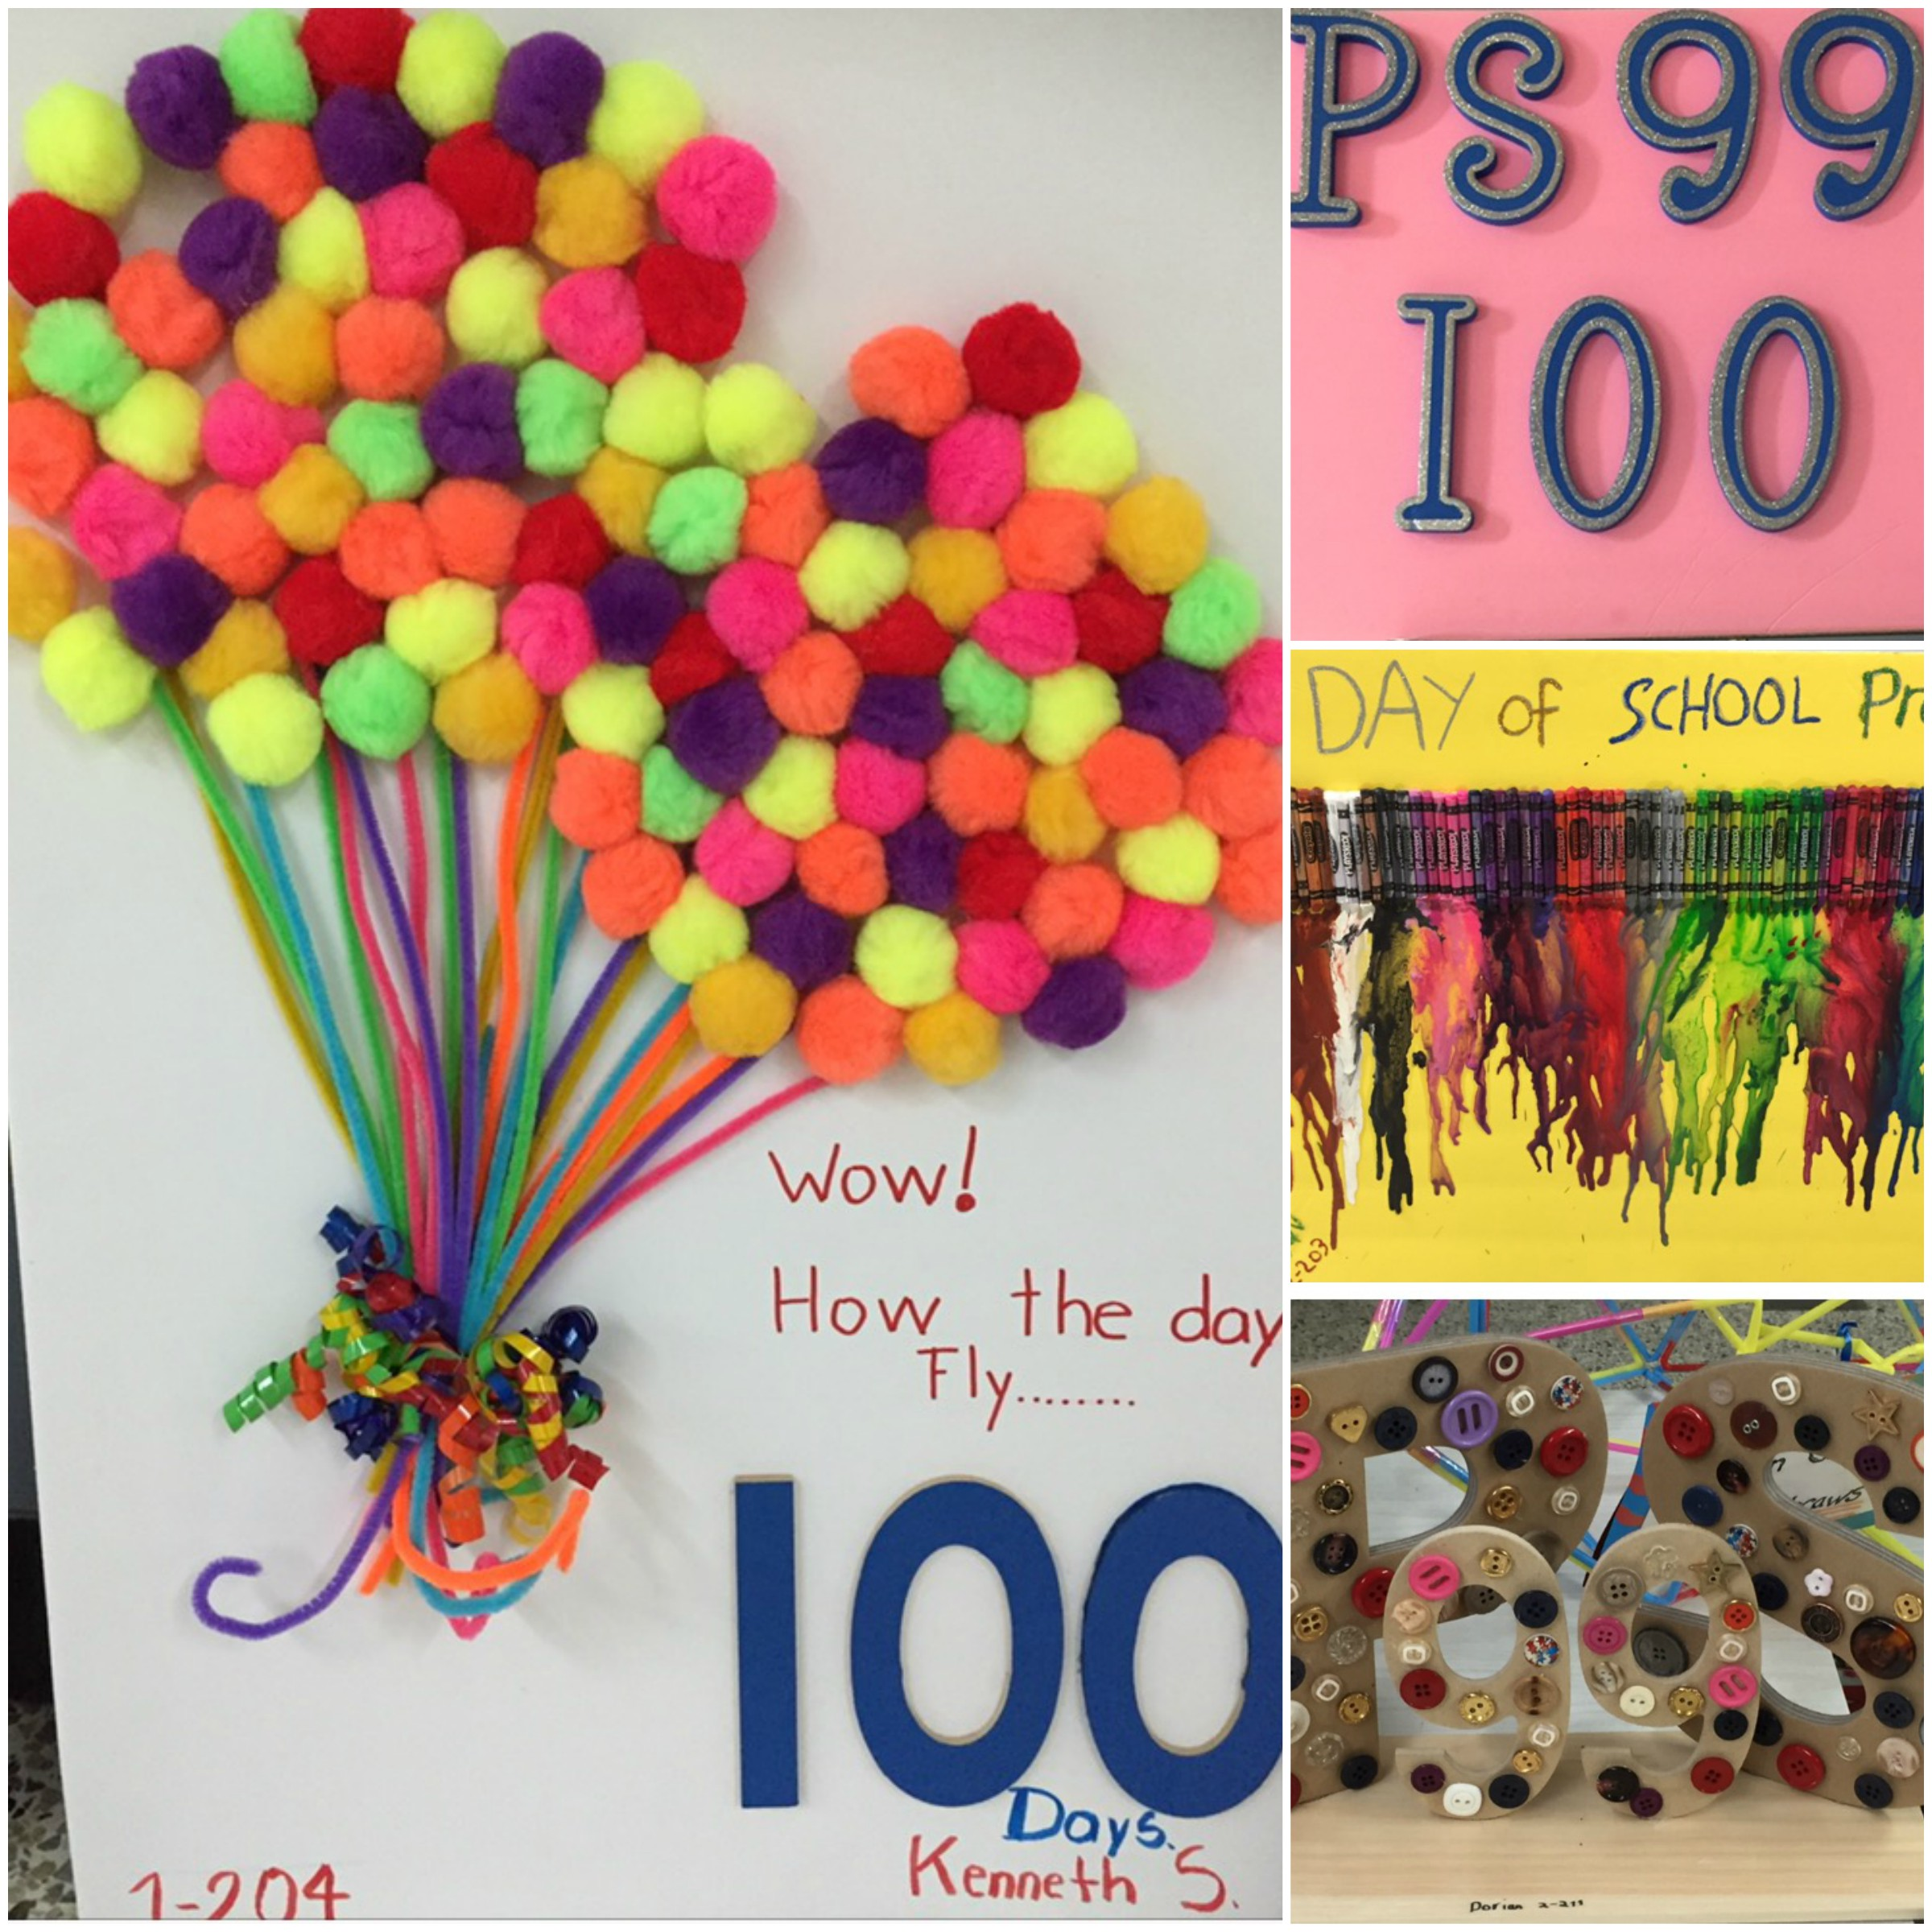 100 Days in P.S.99